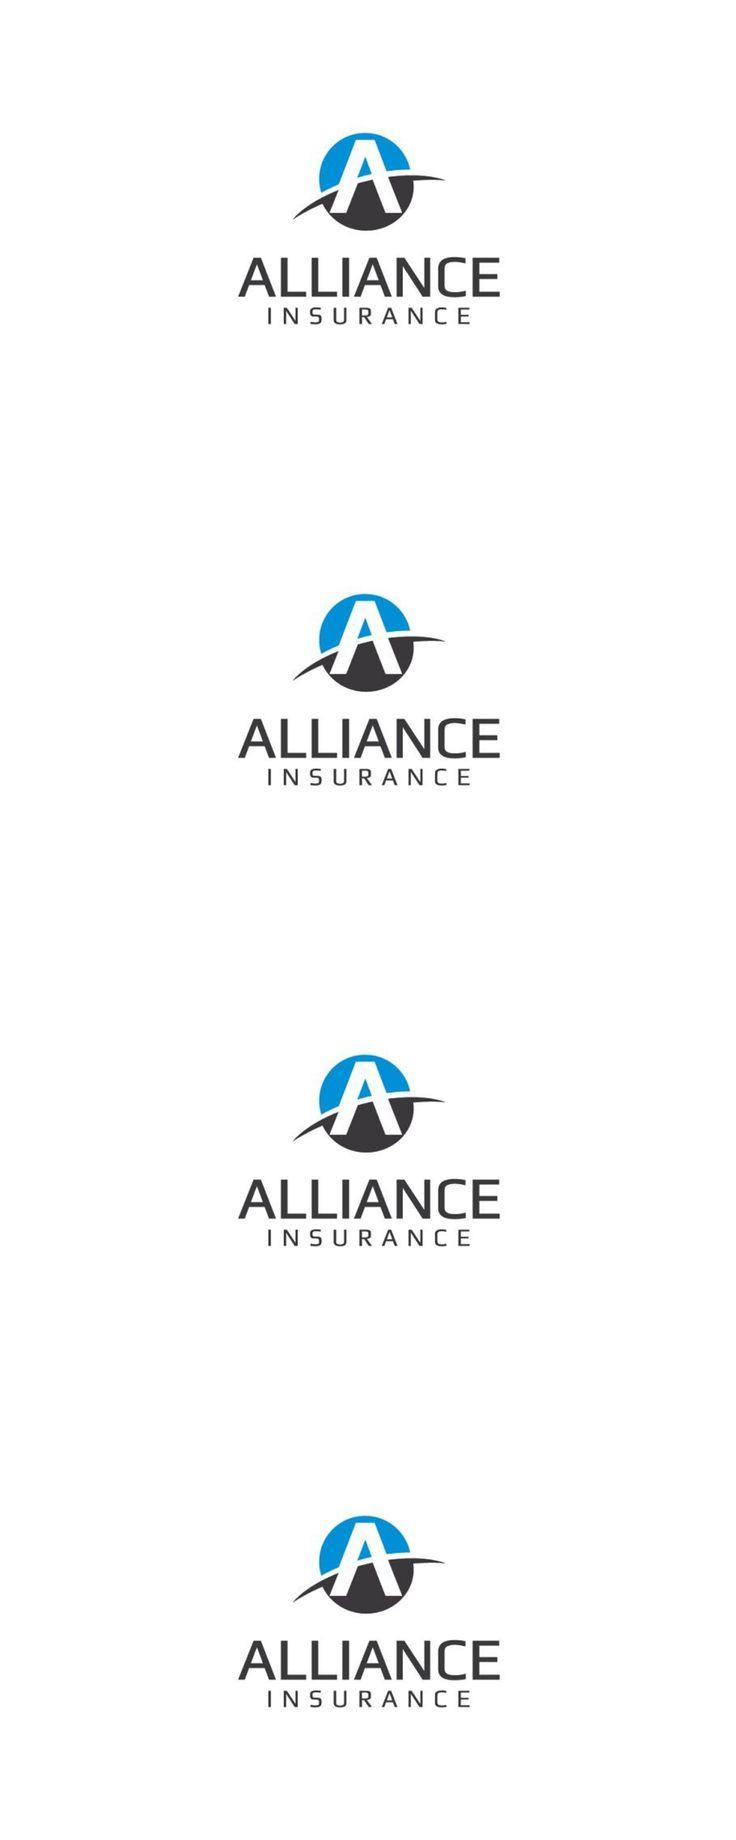 Alliance insurance logo template logo templates logo